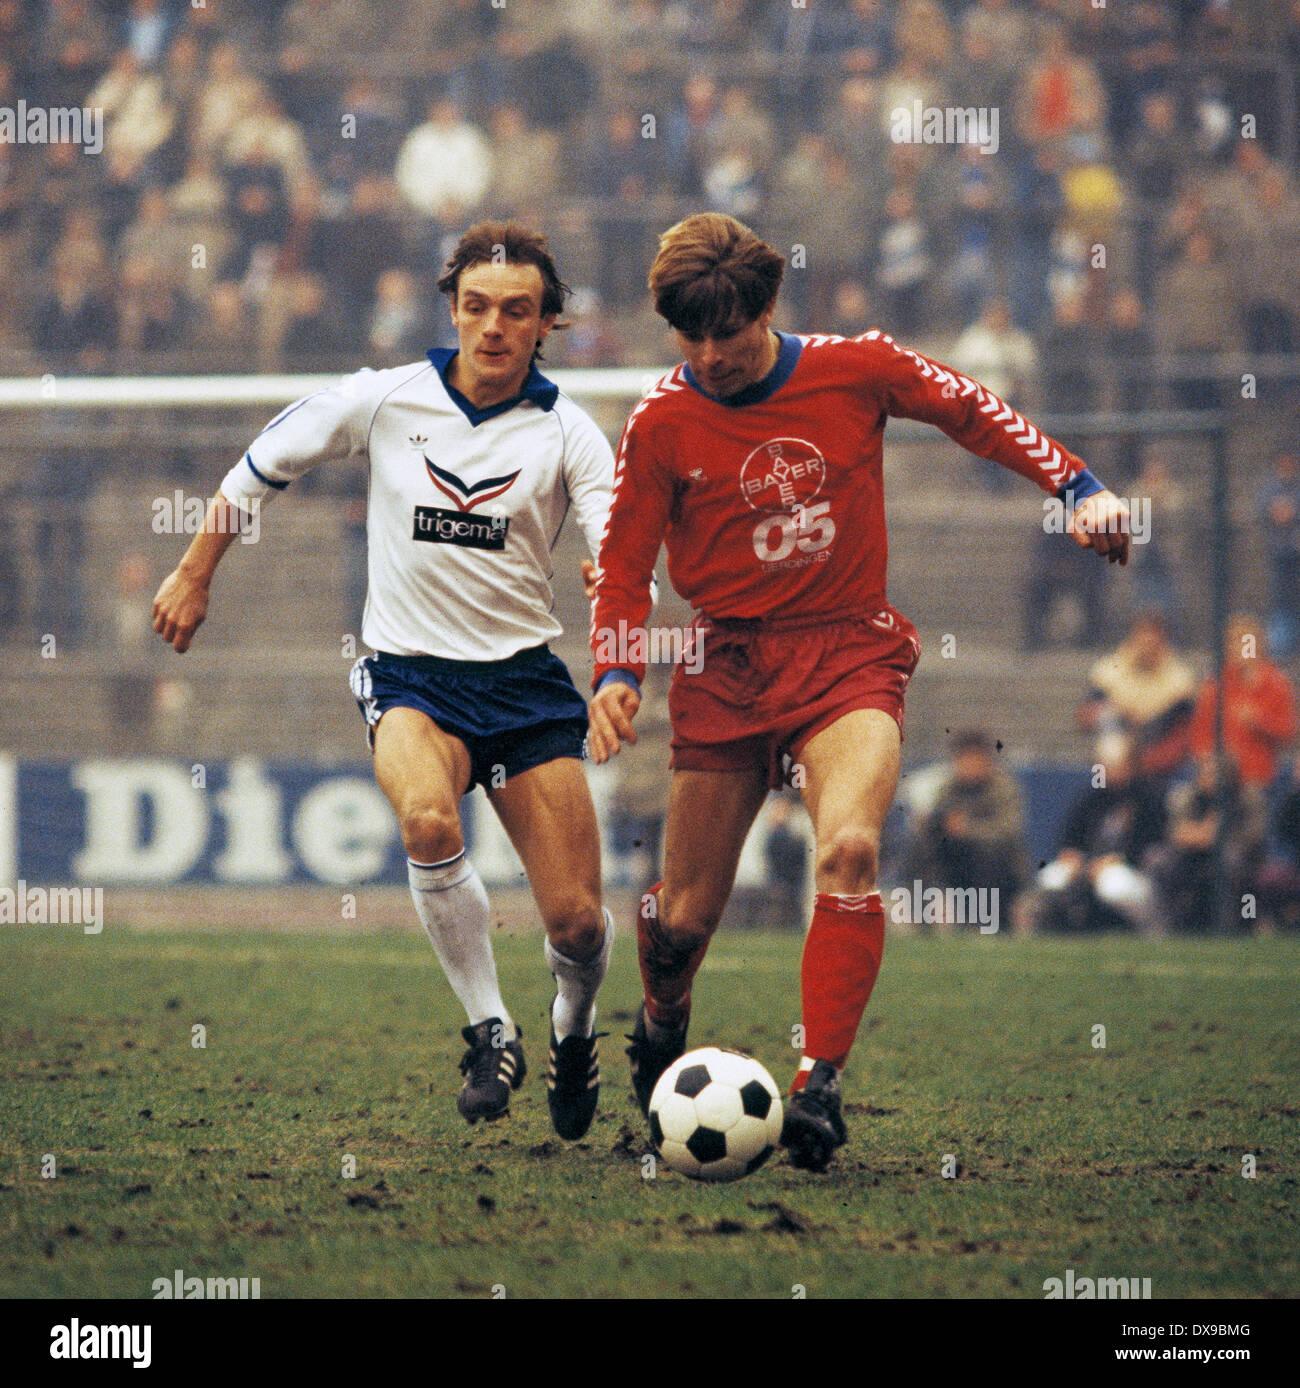 football, Bundesliga, 1979/1980, Parkstadion, FC Schalke 04 versus FC Bayer 05 Uerdingen 1:2, scene of the match, Ruediger Abramczik (S04) left and Norbert Brinkmann (Bayer) - Stock Image